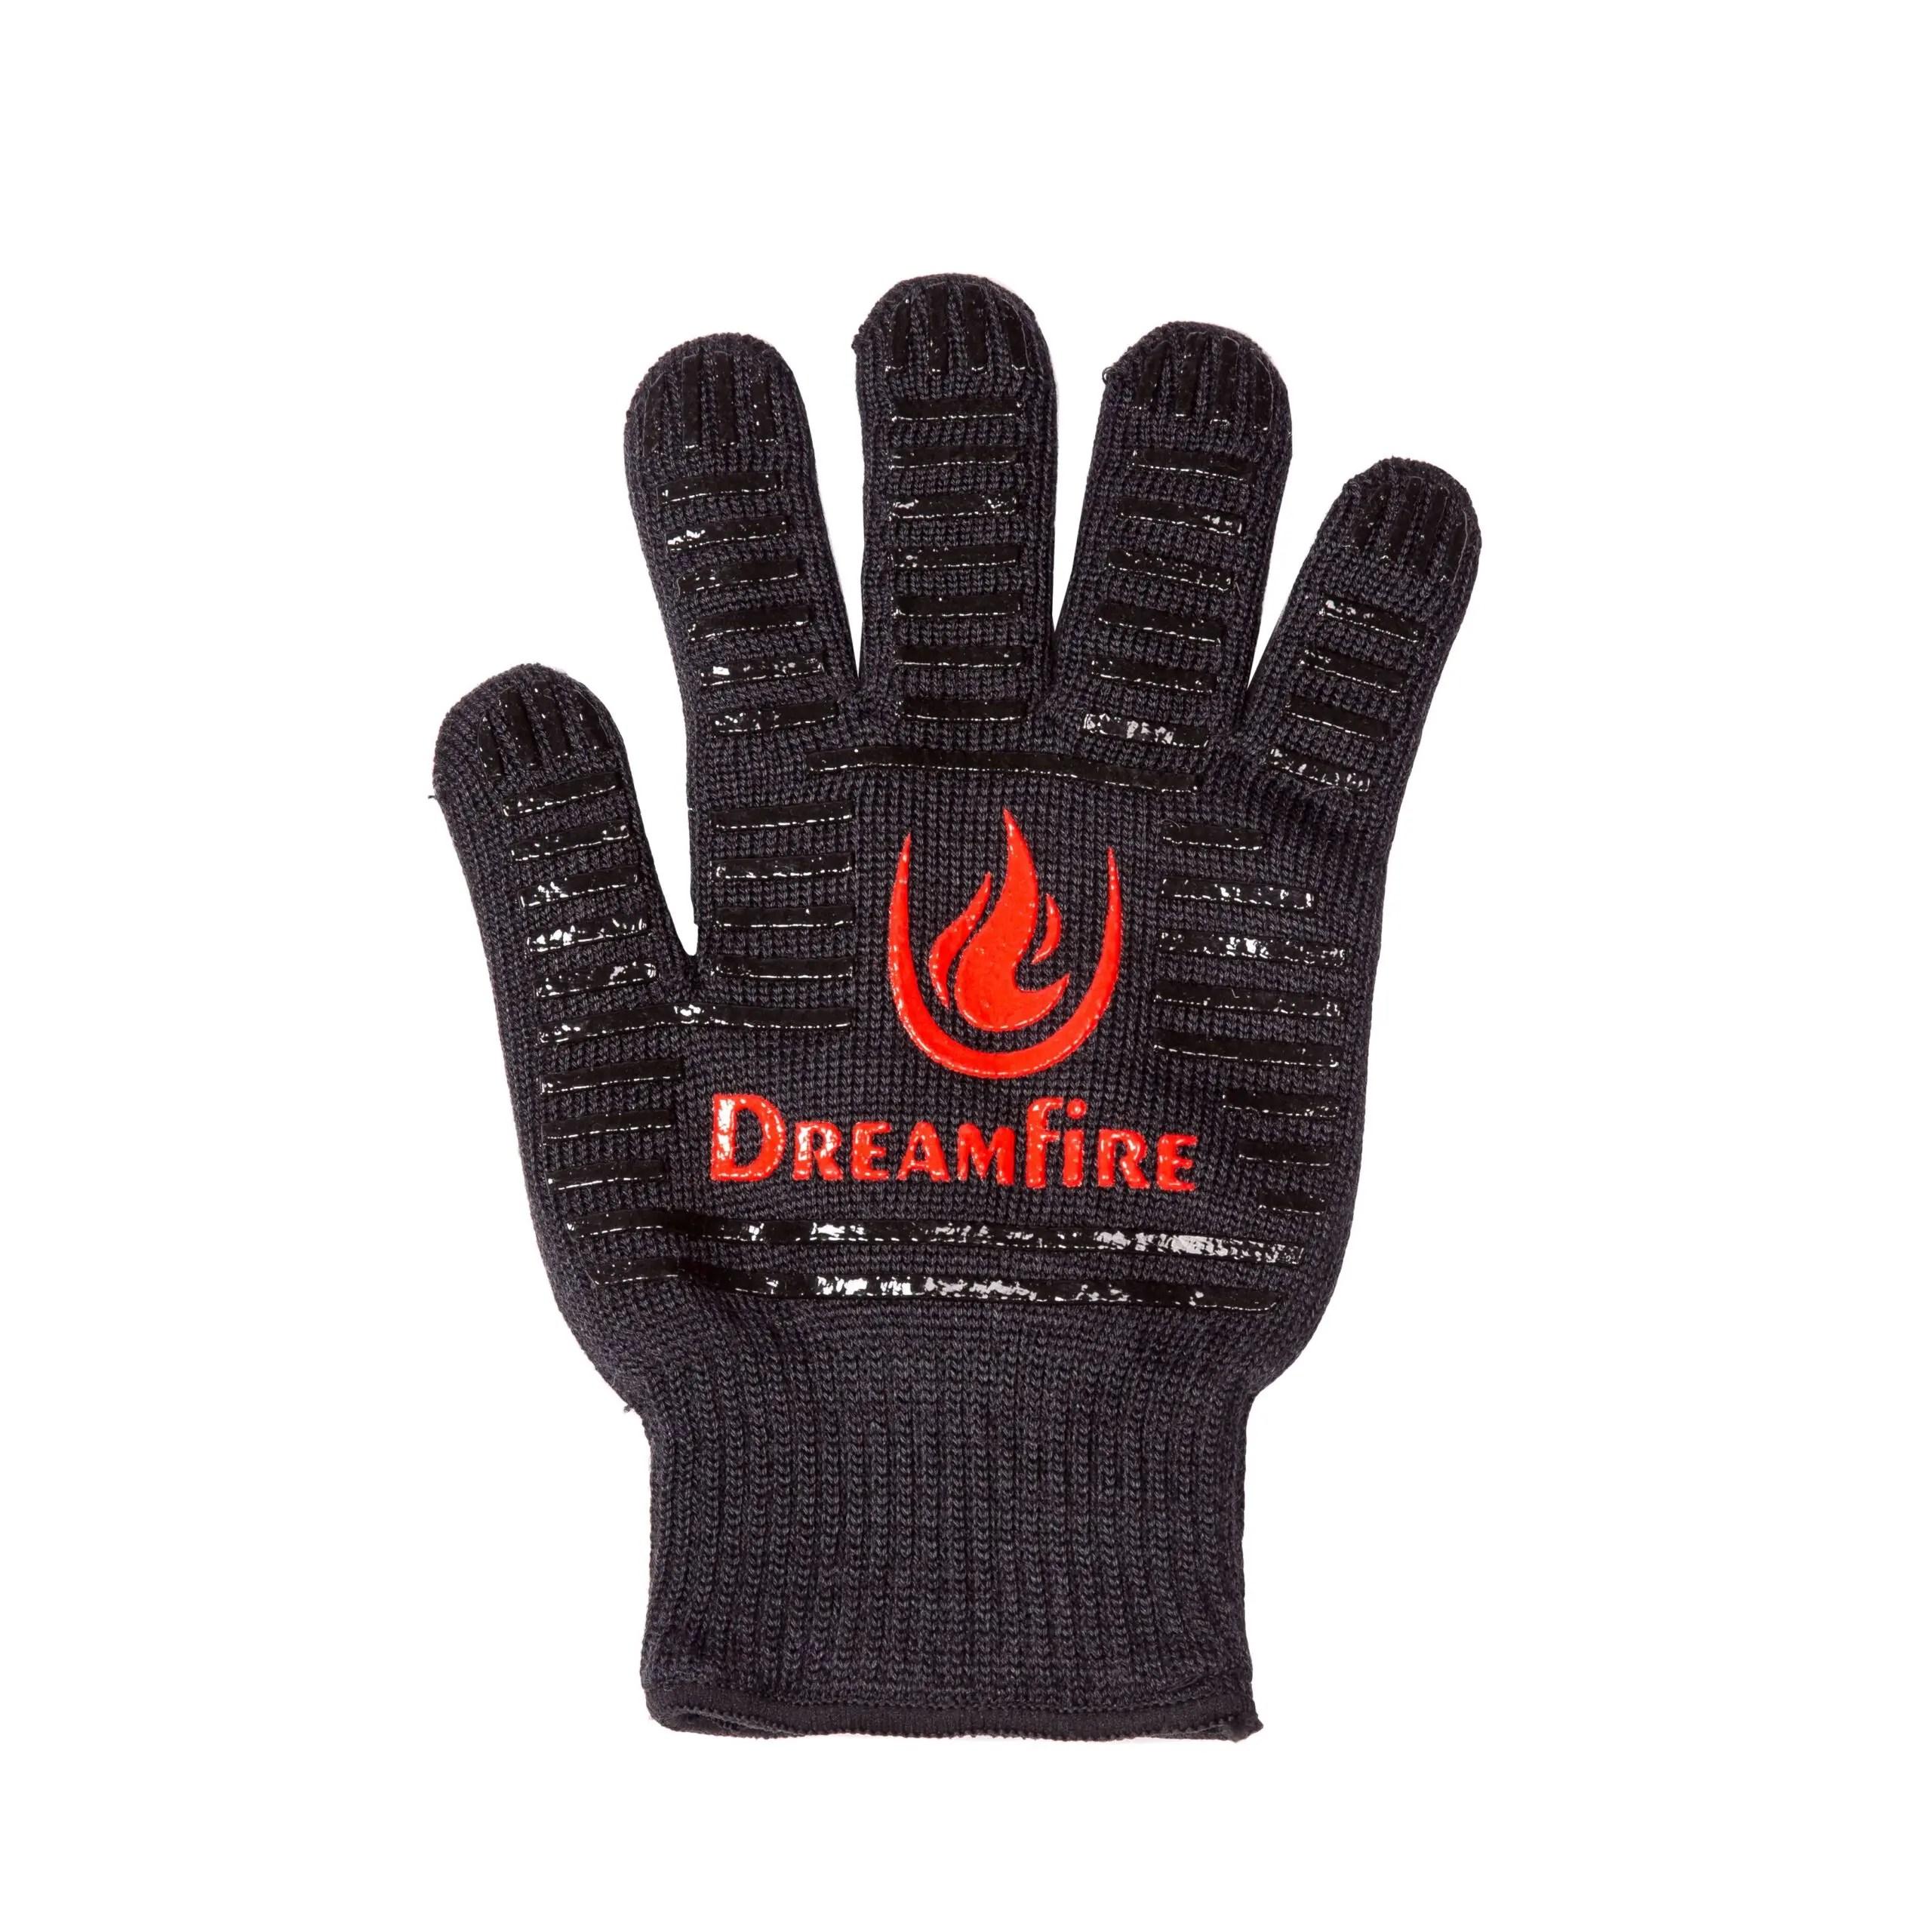 Dreamfire heat resistant grilling glove